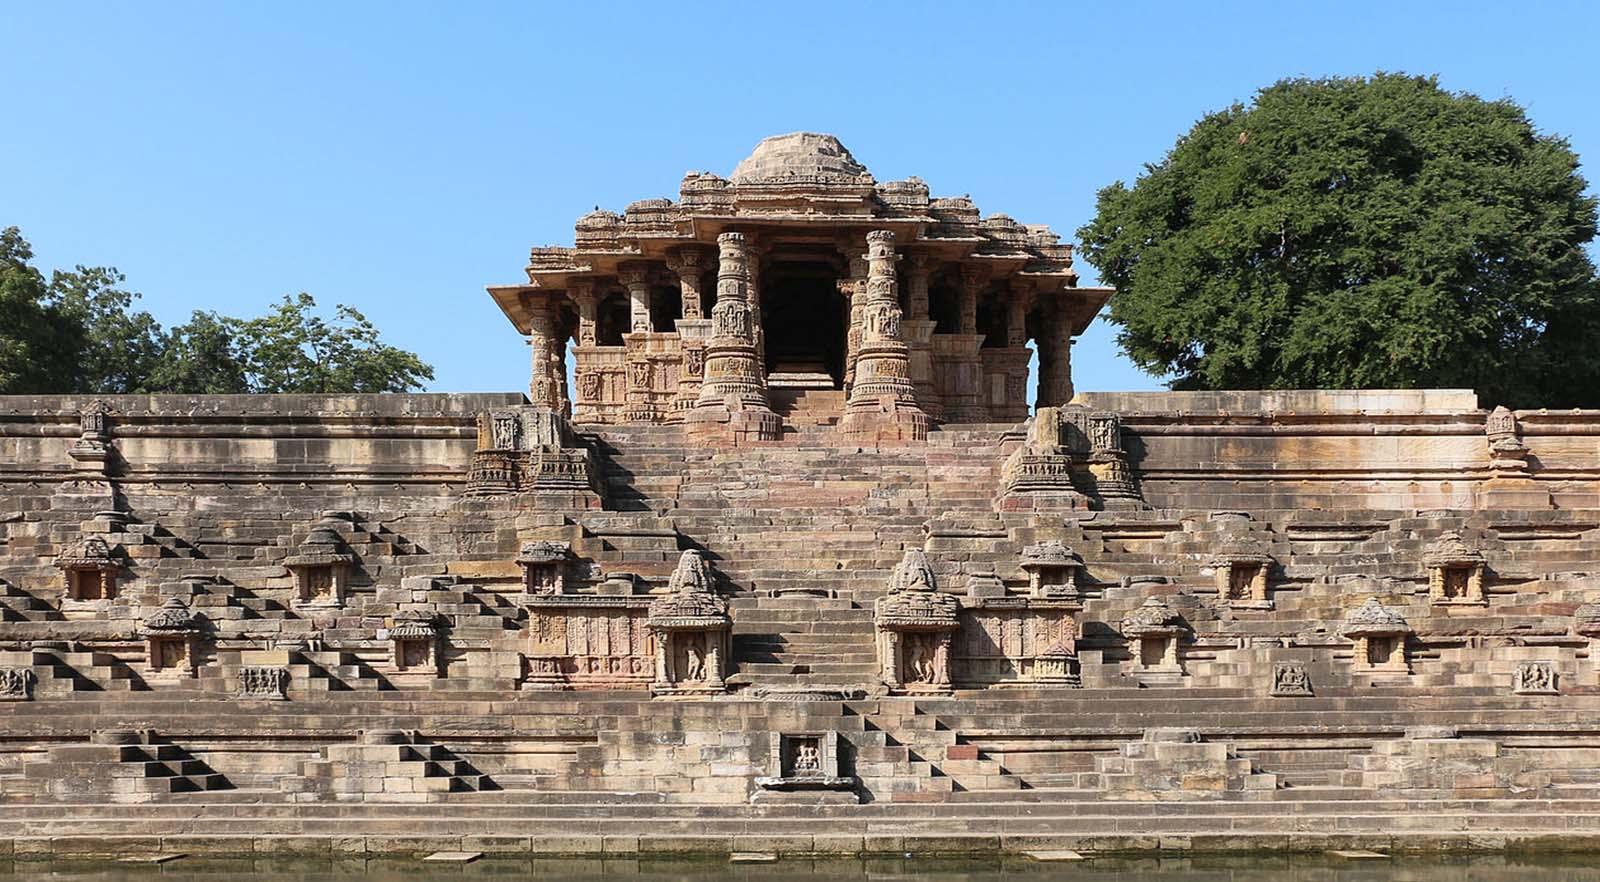 Gujarat - Modhera